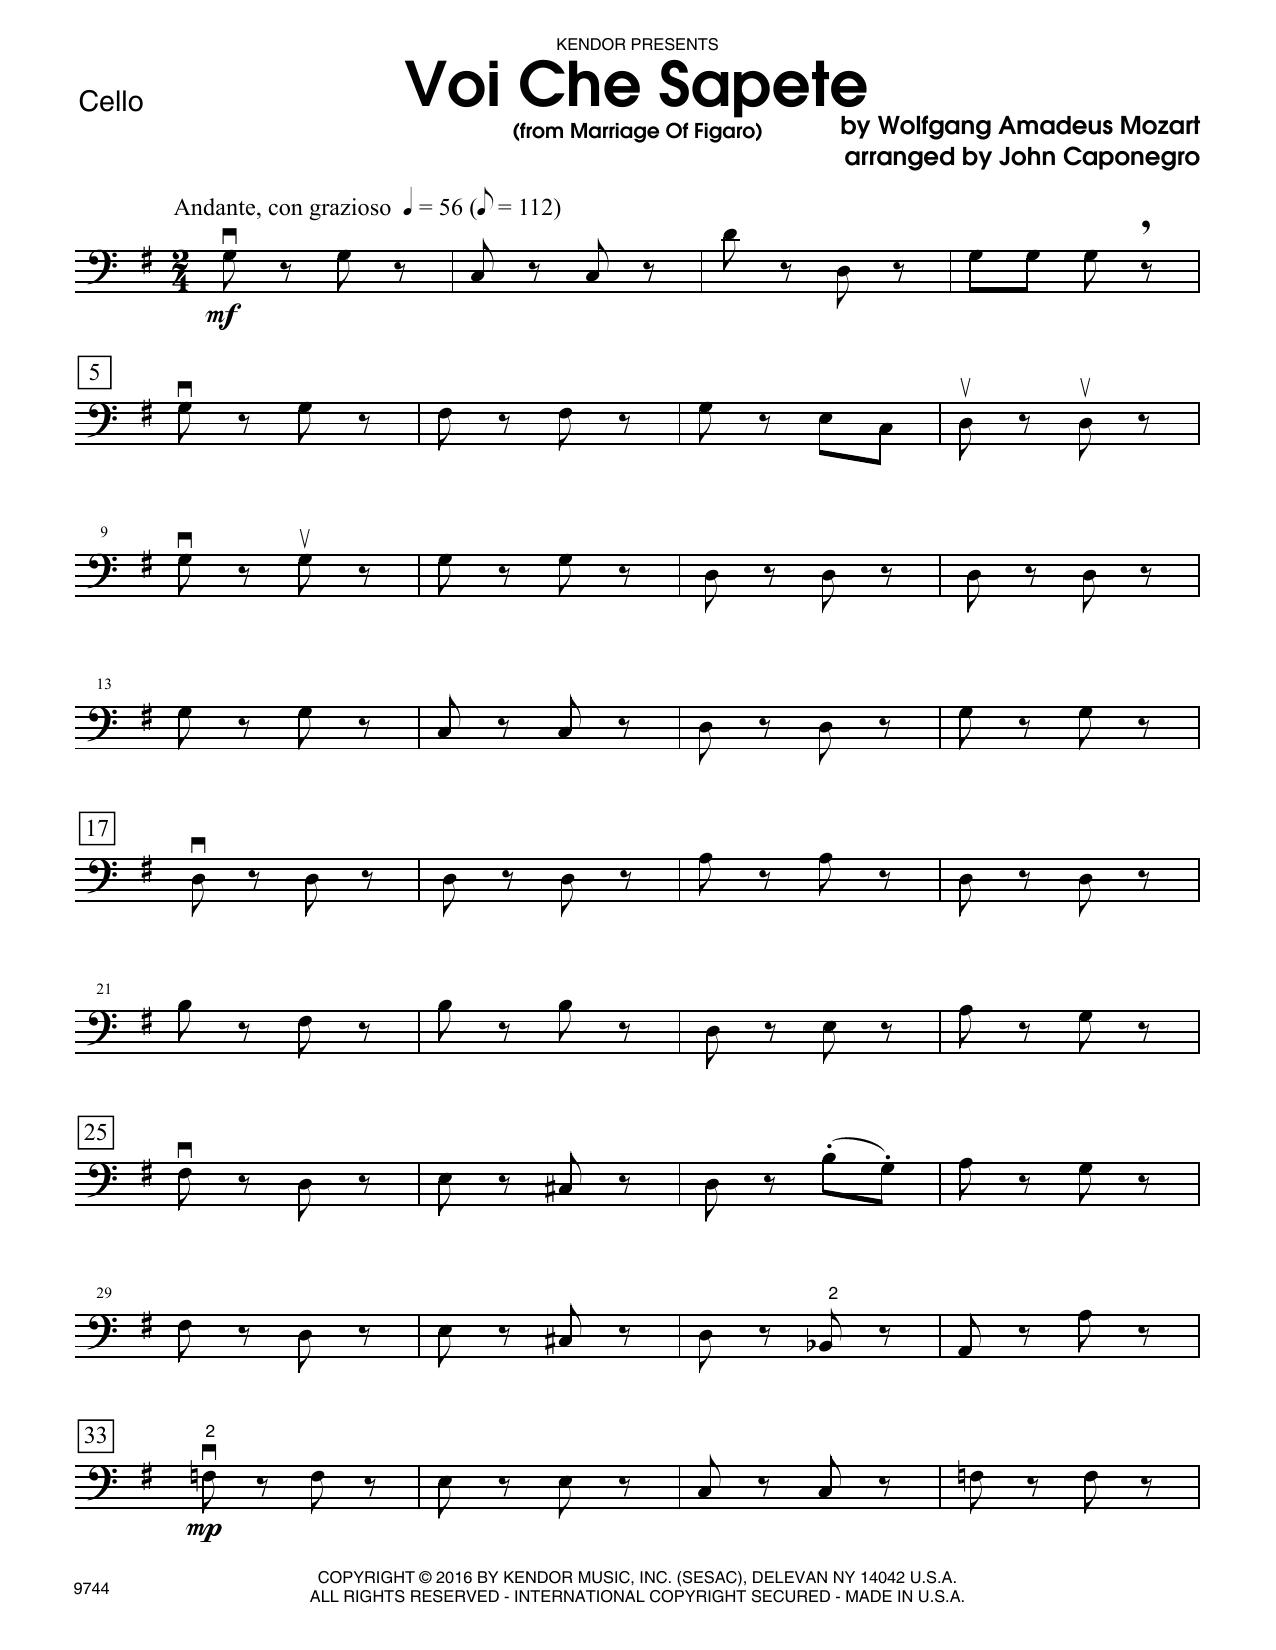 Voi Che Sapete (from Marriage Of Figaro) - Cello